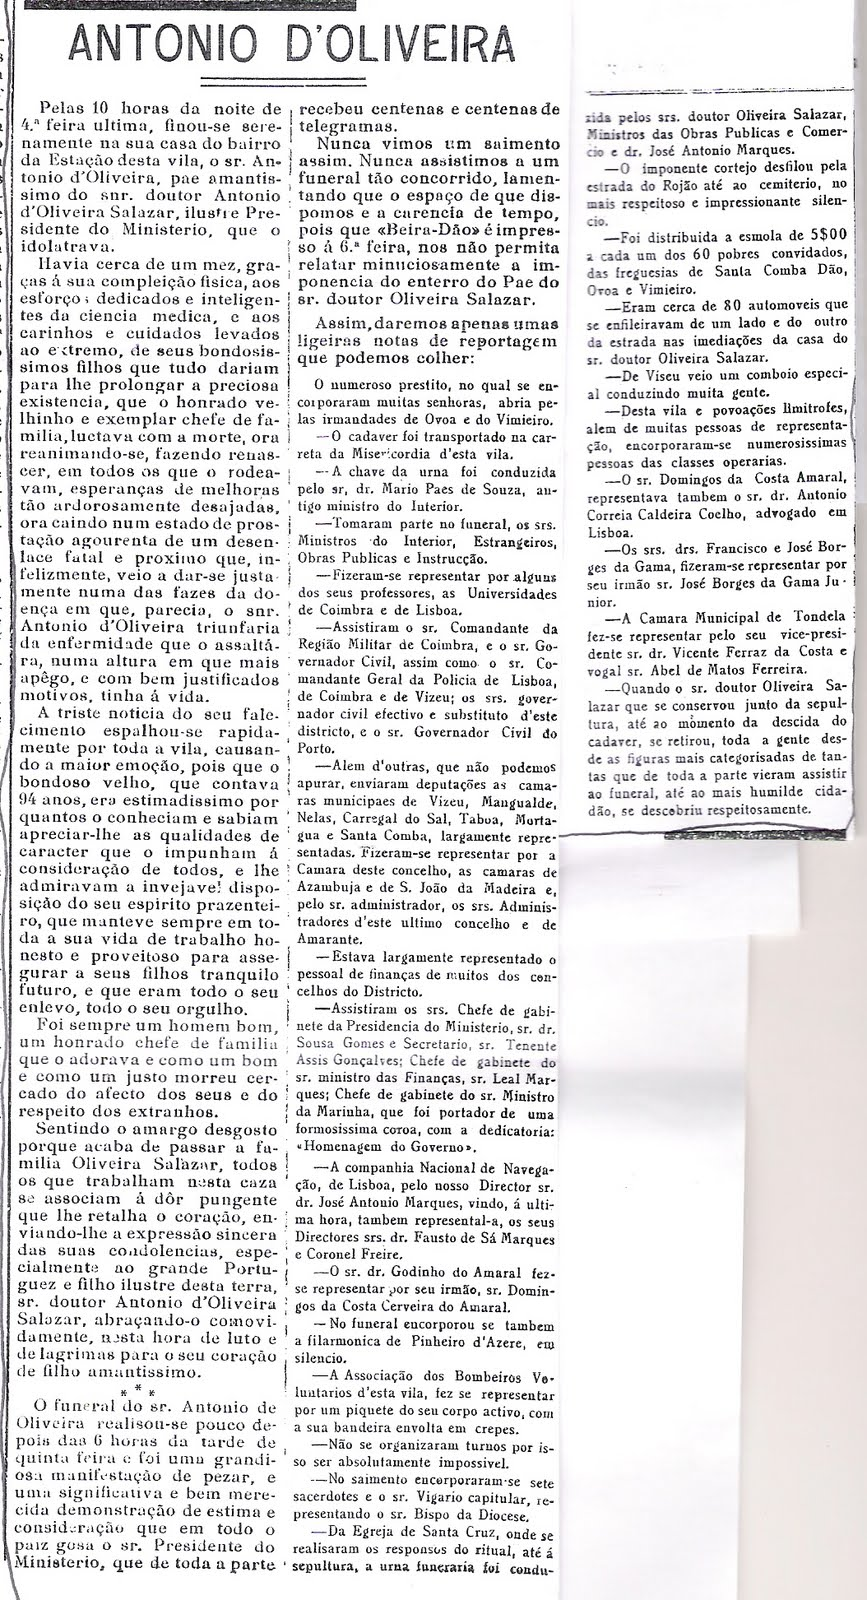 Outubro de 1932, notica da morte do Pai do Dr. António Oliveira Salazar